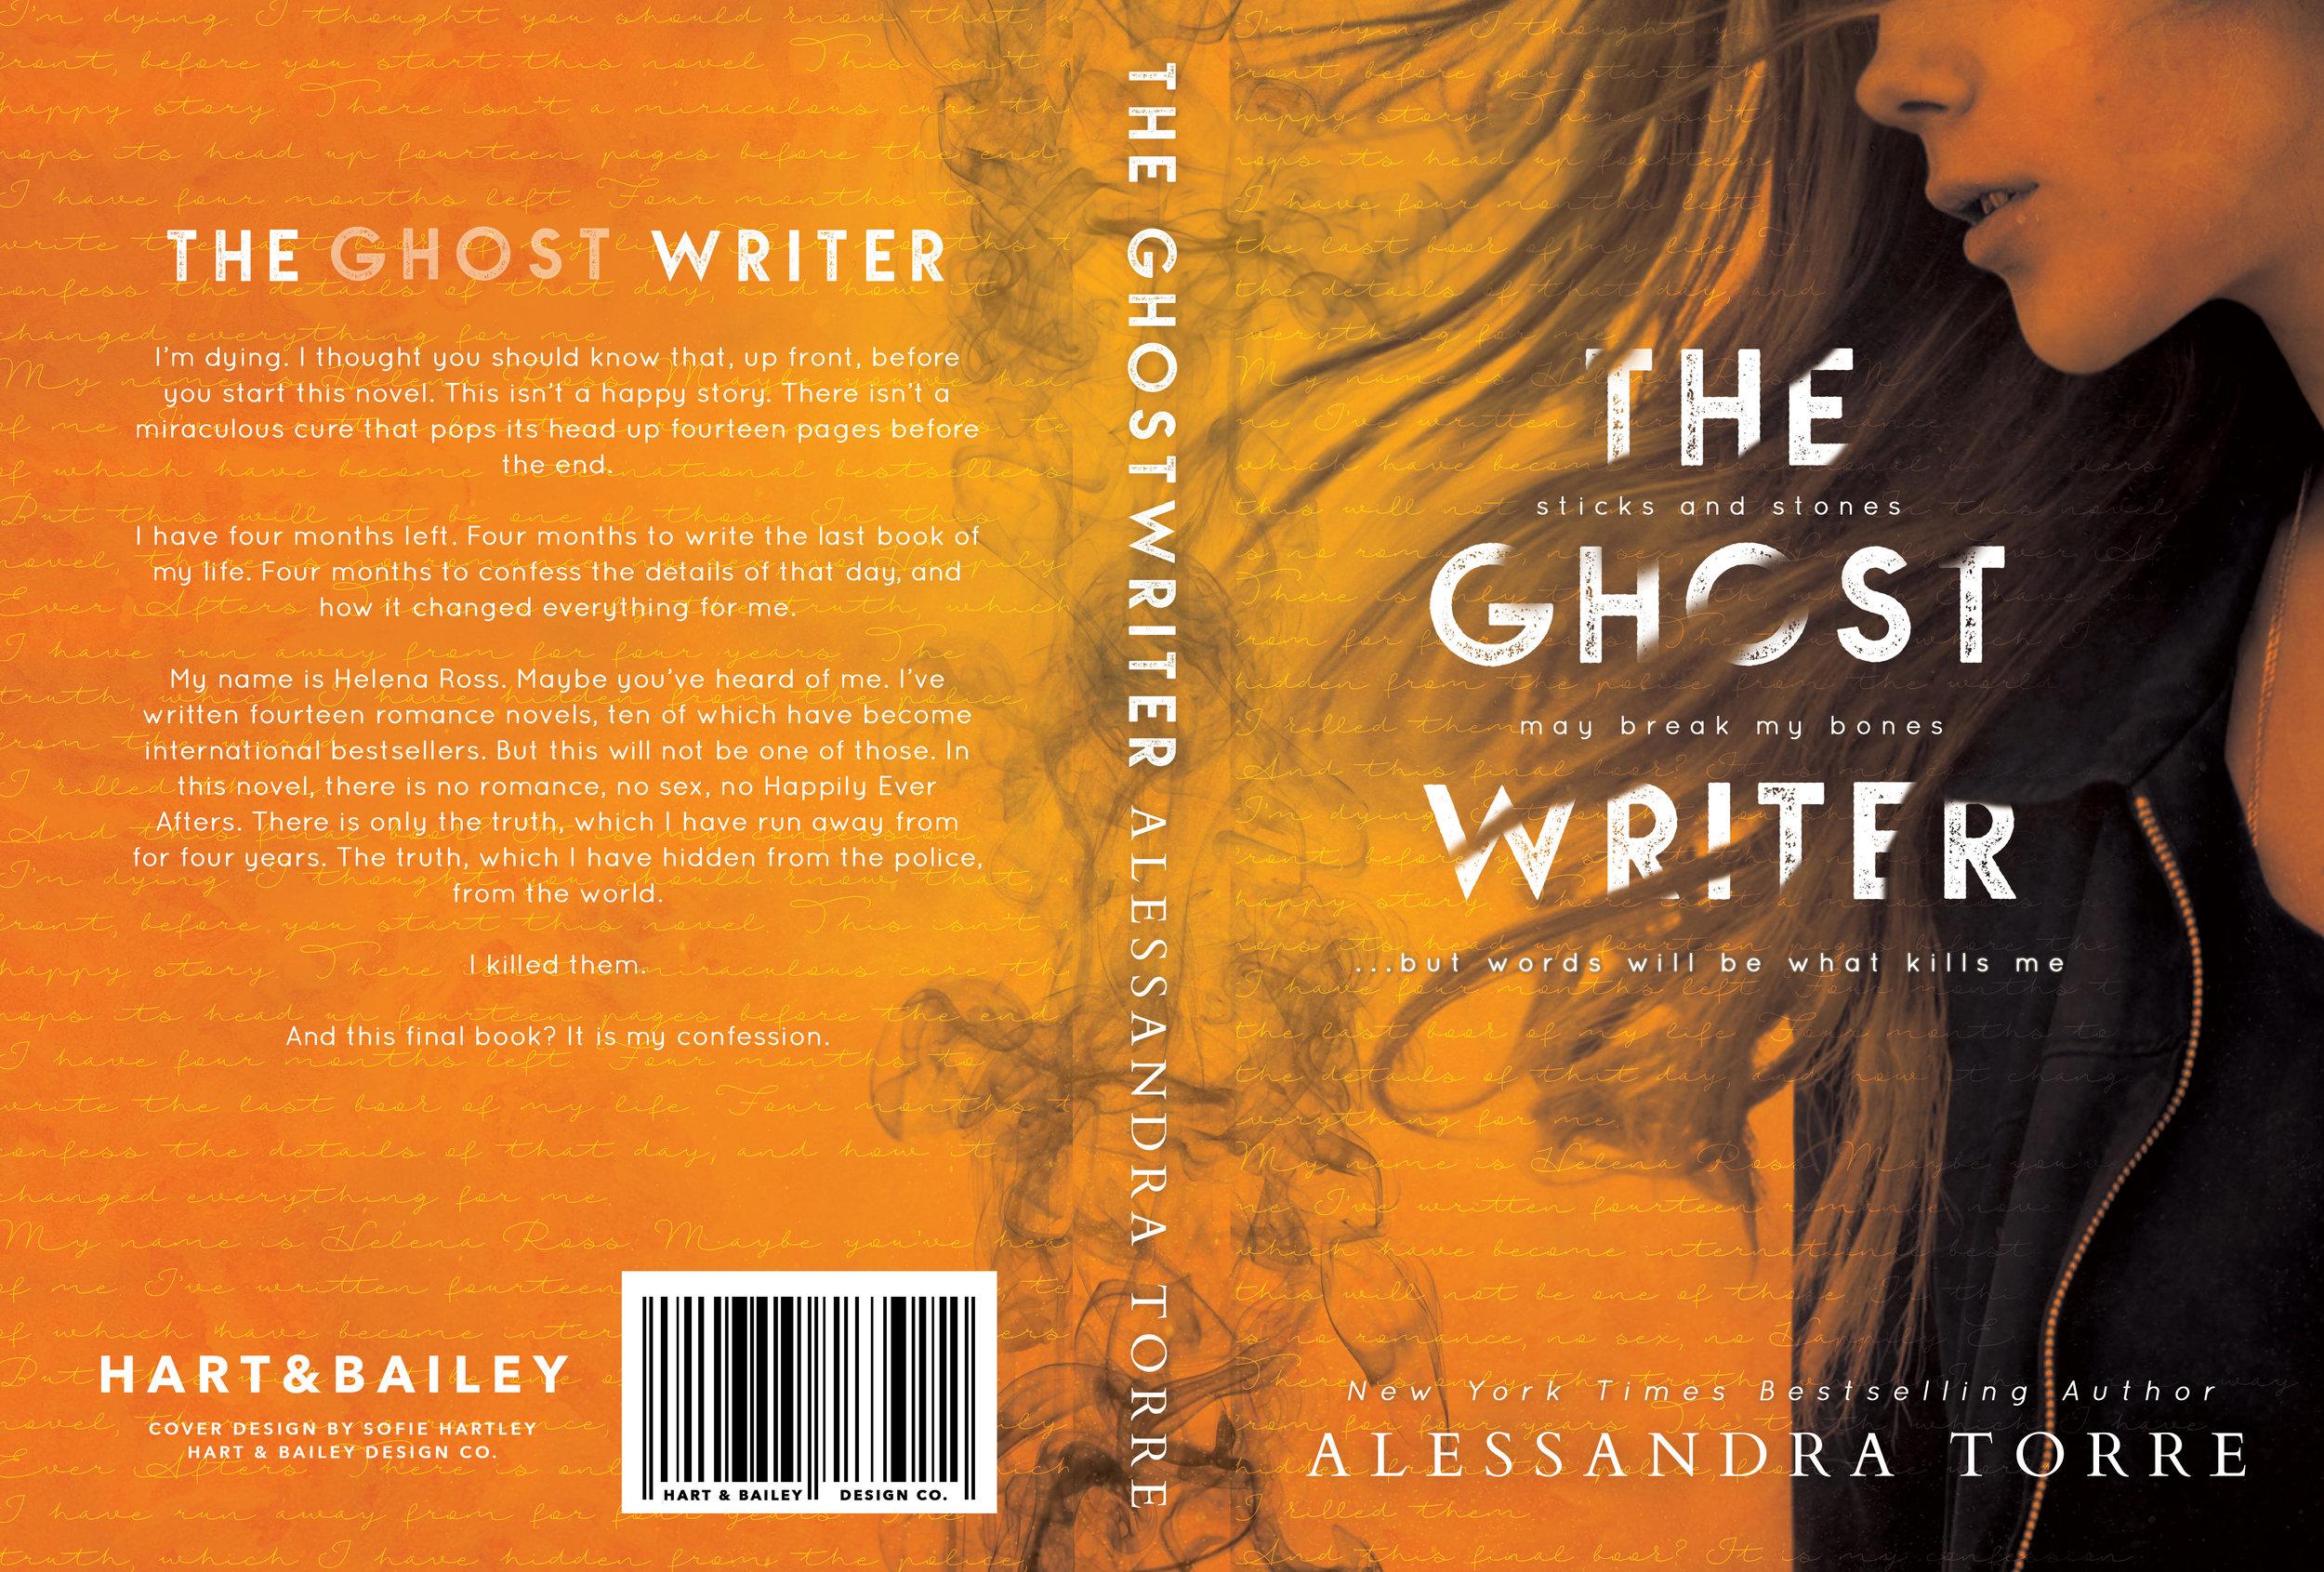 Ghostwriter - full spread 07252017.jpg